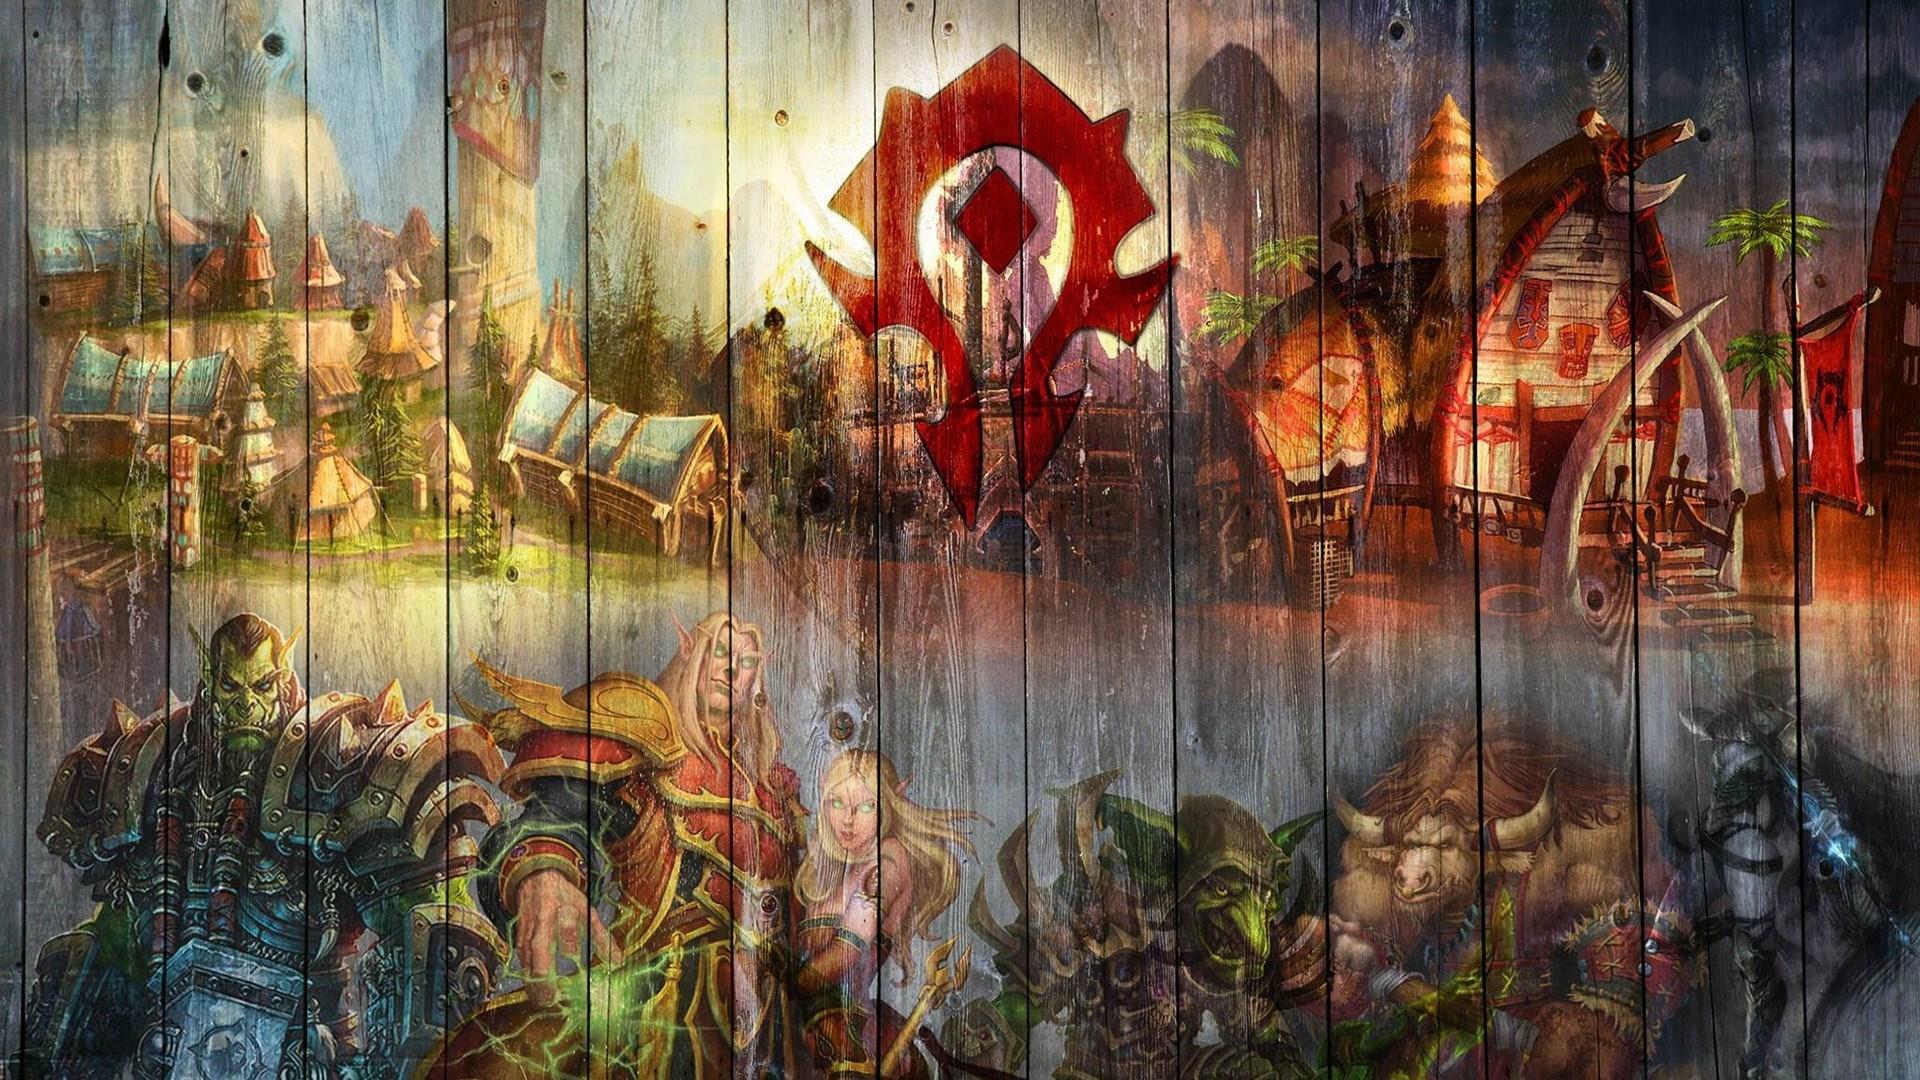 world-of-warcraft-hd-wallpaper-wpc58010421